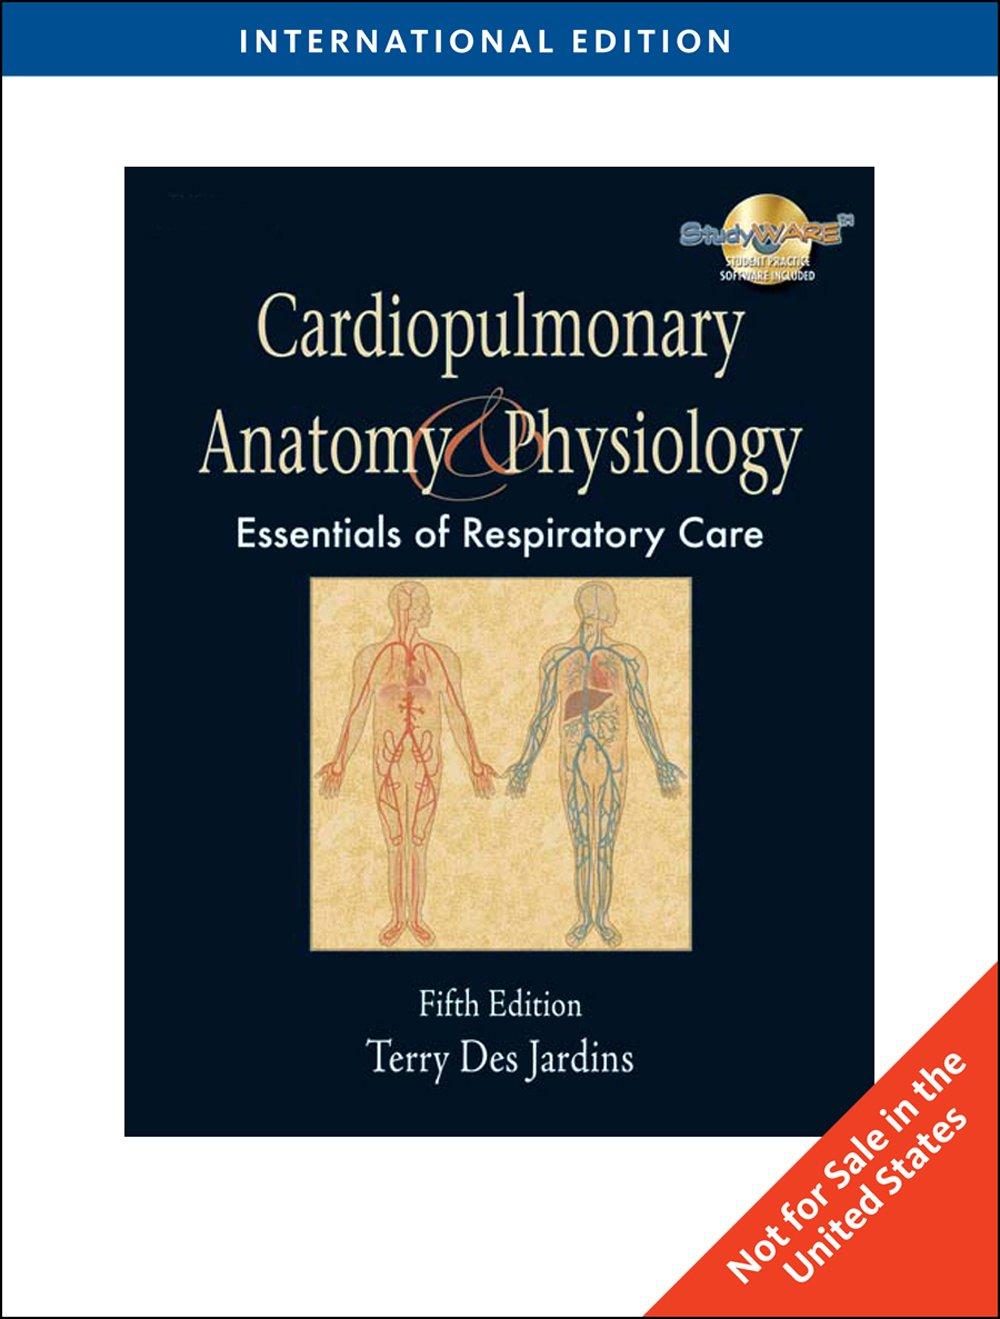 Großartig Cardiopulmonary Anatomy And Physiology Essentials For ...